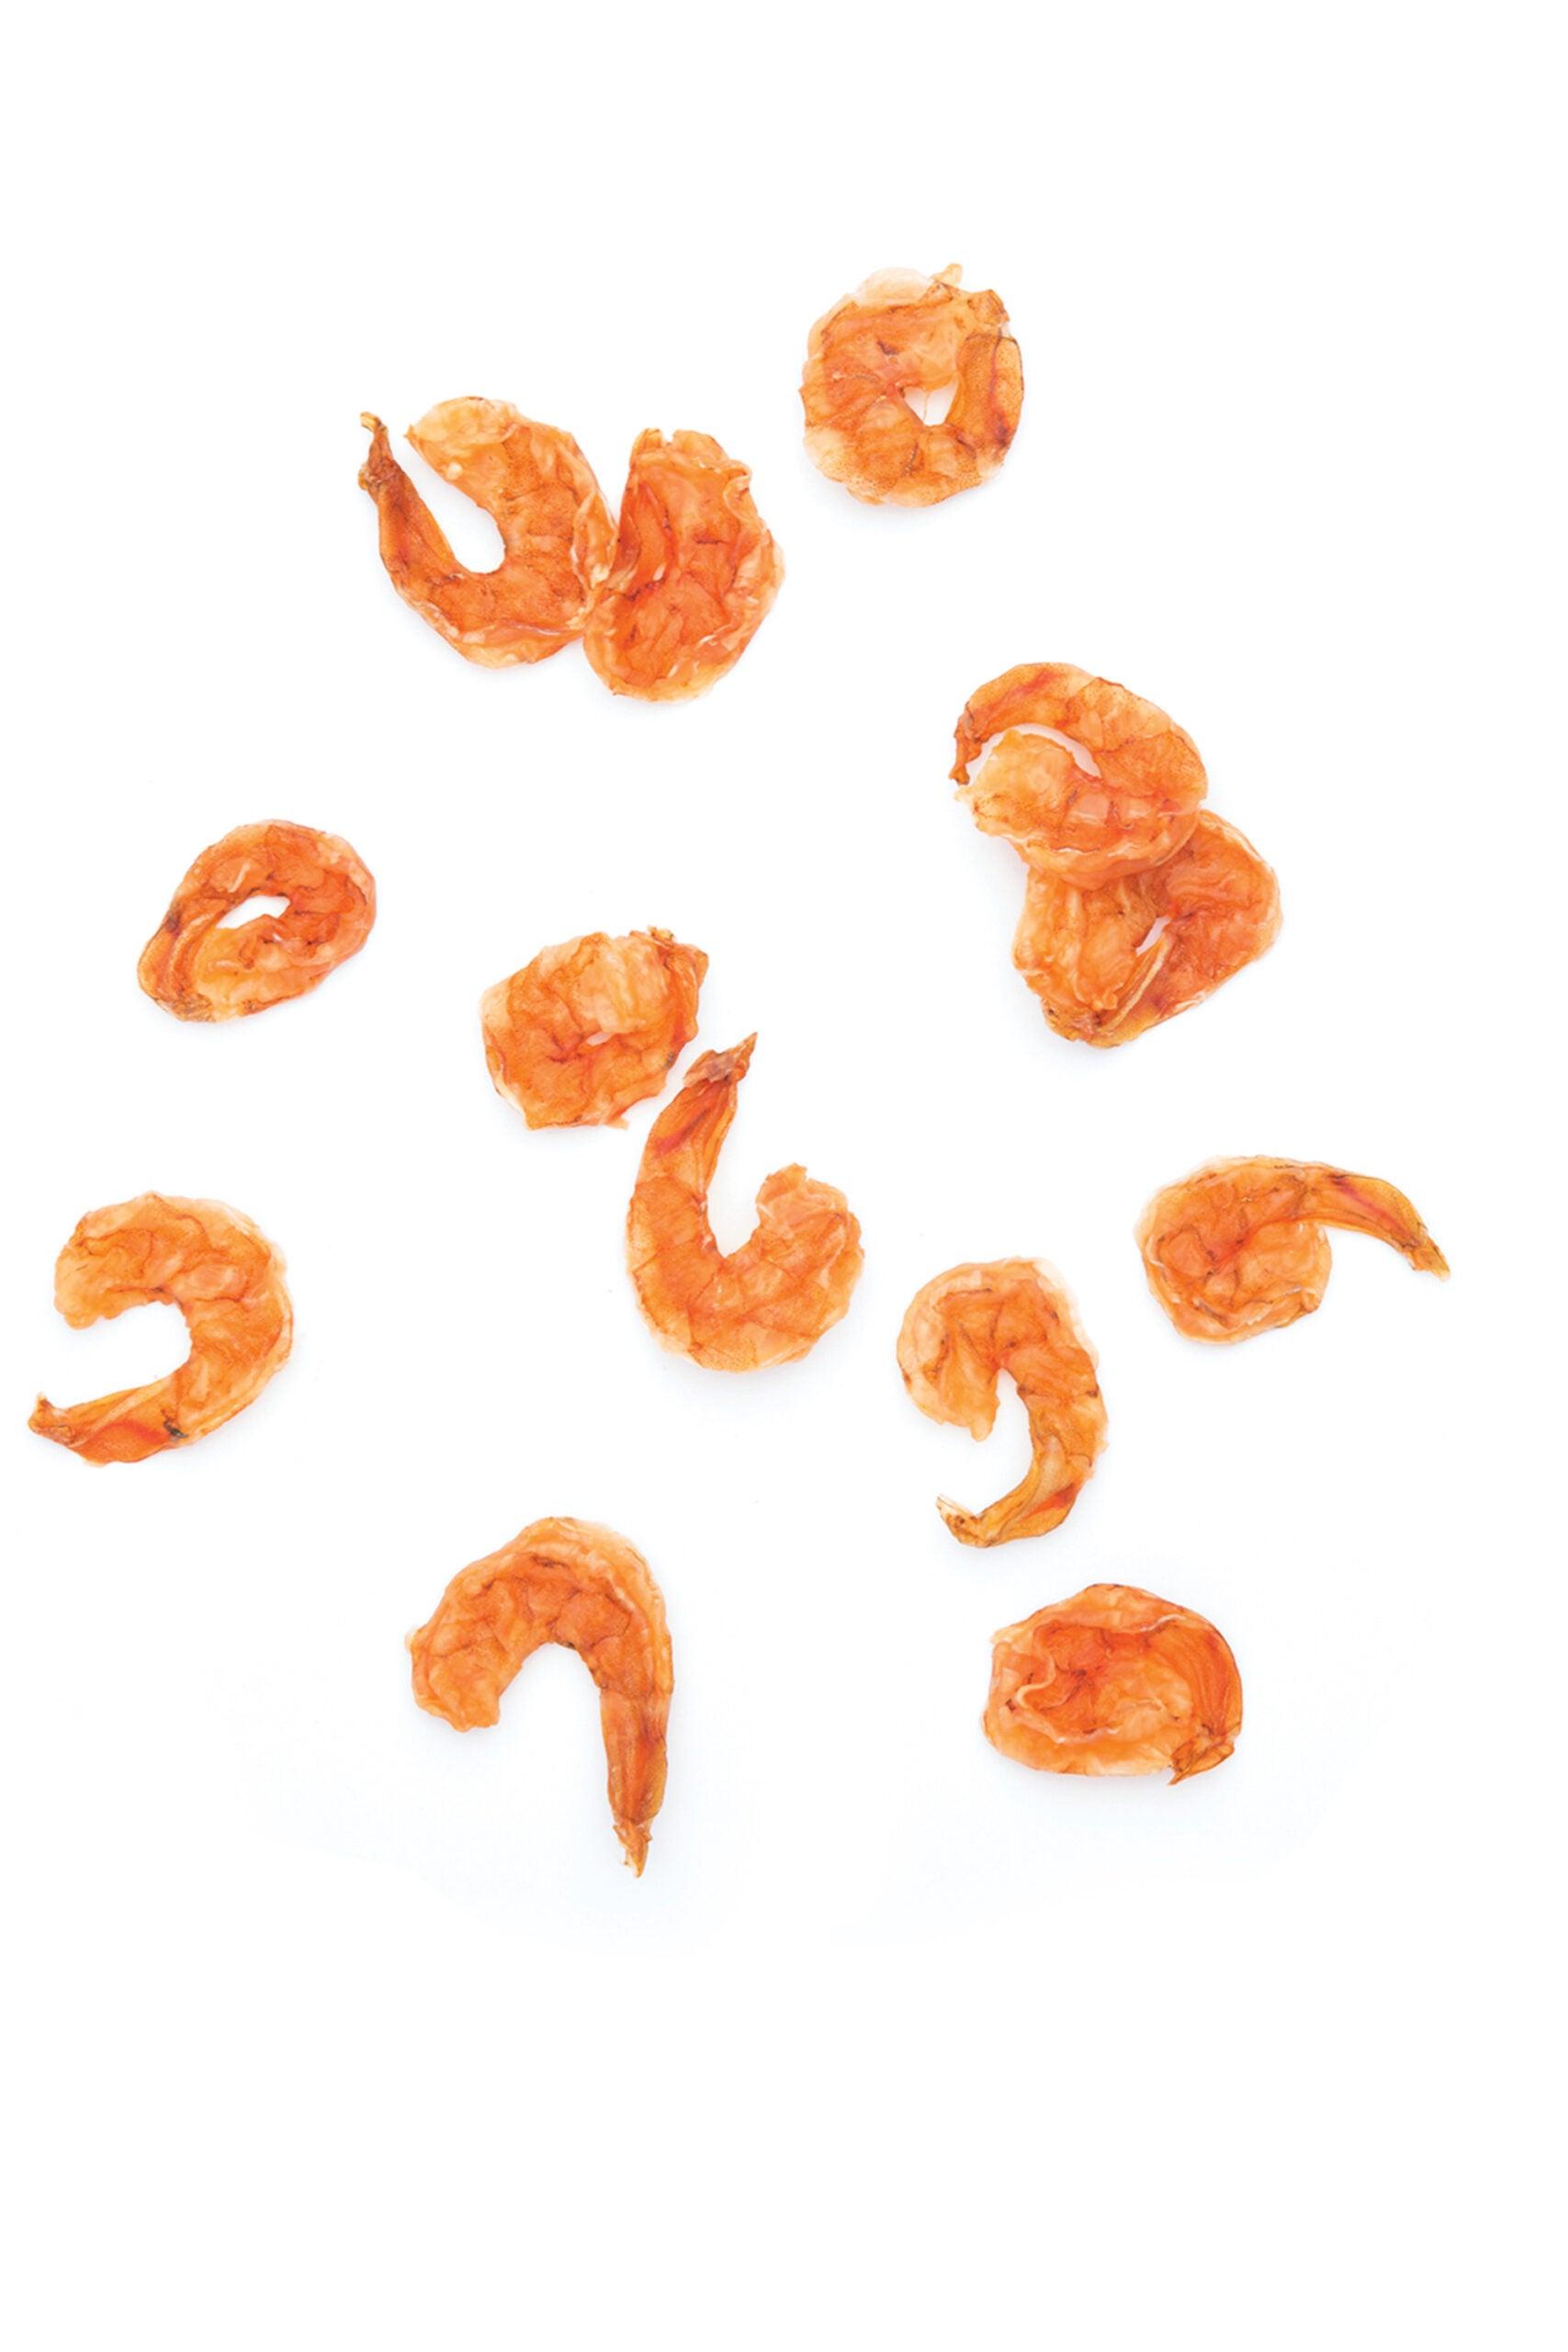 A Shrimp that Eats Like a Lobster